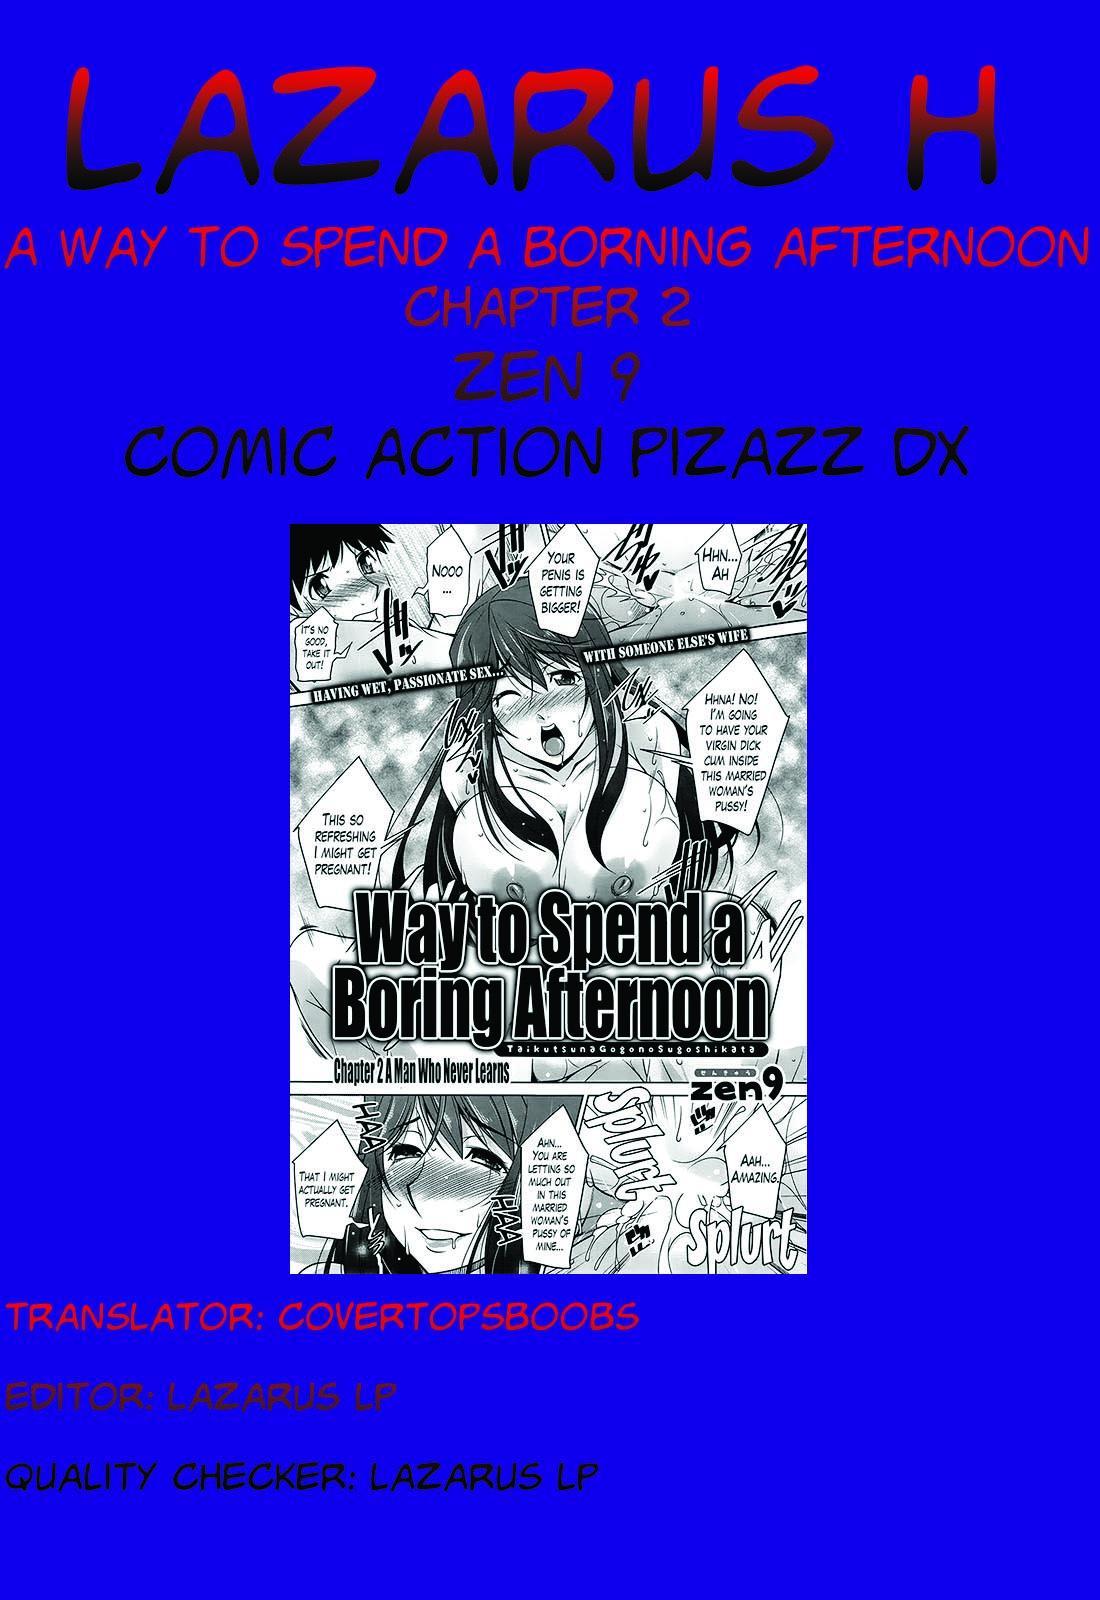 [Zen9] Taikutsu na Gogo no Sugoshikata Ch. 1-4   A Way to Spend a Boring Afternoon Ch. 1-4 (Action Pizazz DX 2013-12) [English](hentai2read.com)[Lazarus H] 38